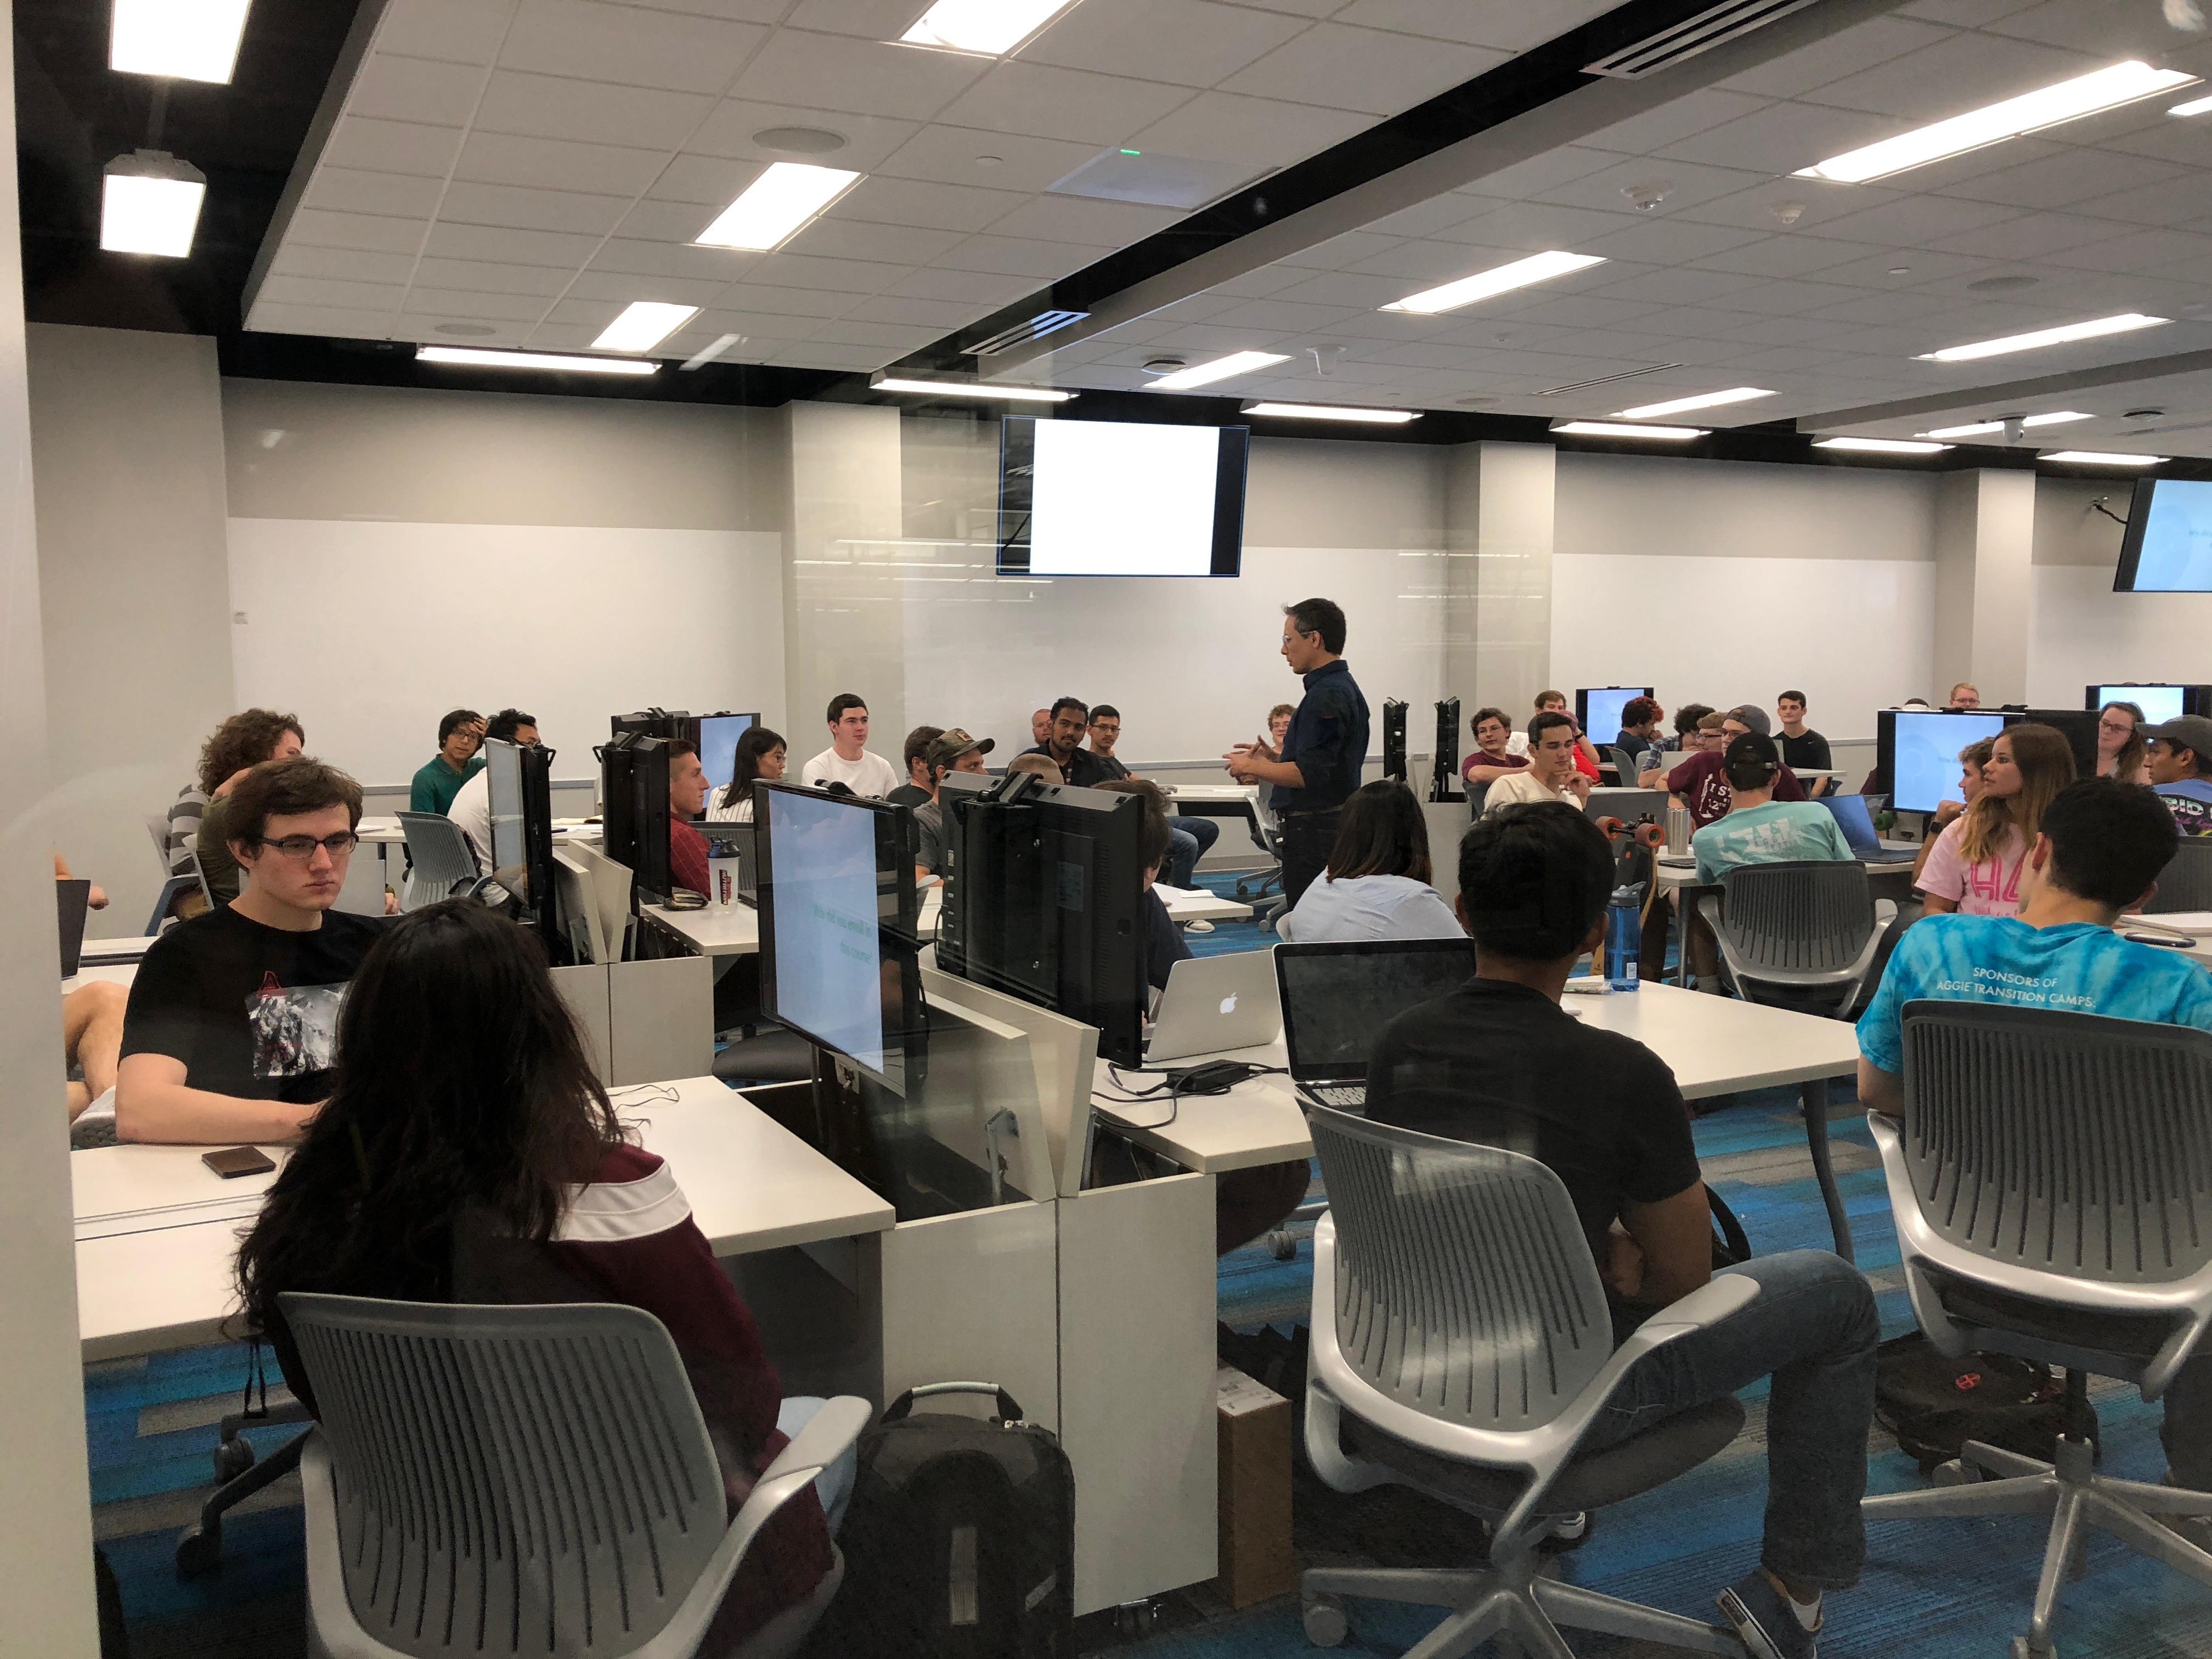 professor-teach-class-active-learning-classroom (1)